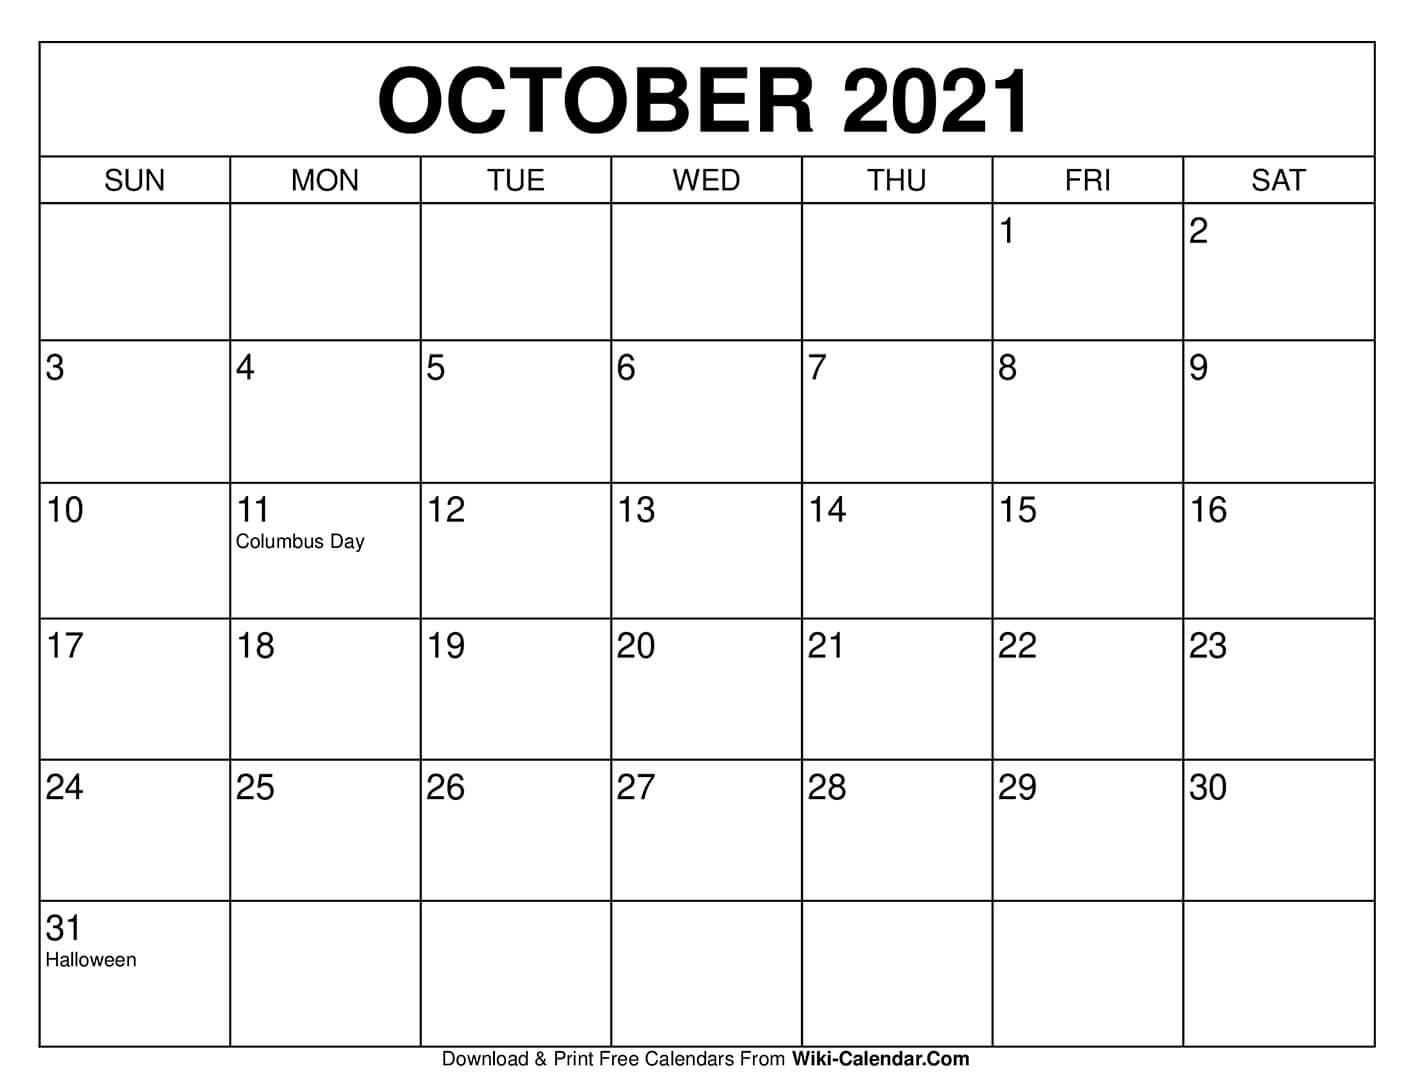 Get October 2021 Calendar Printable Free